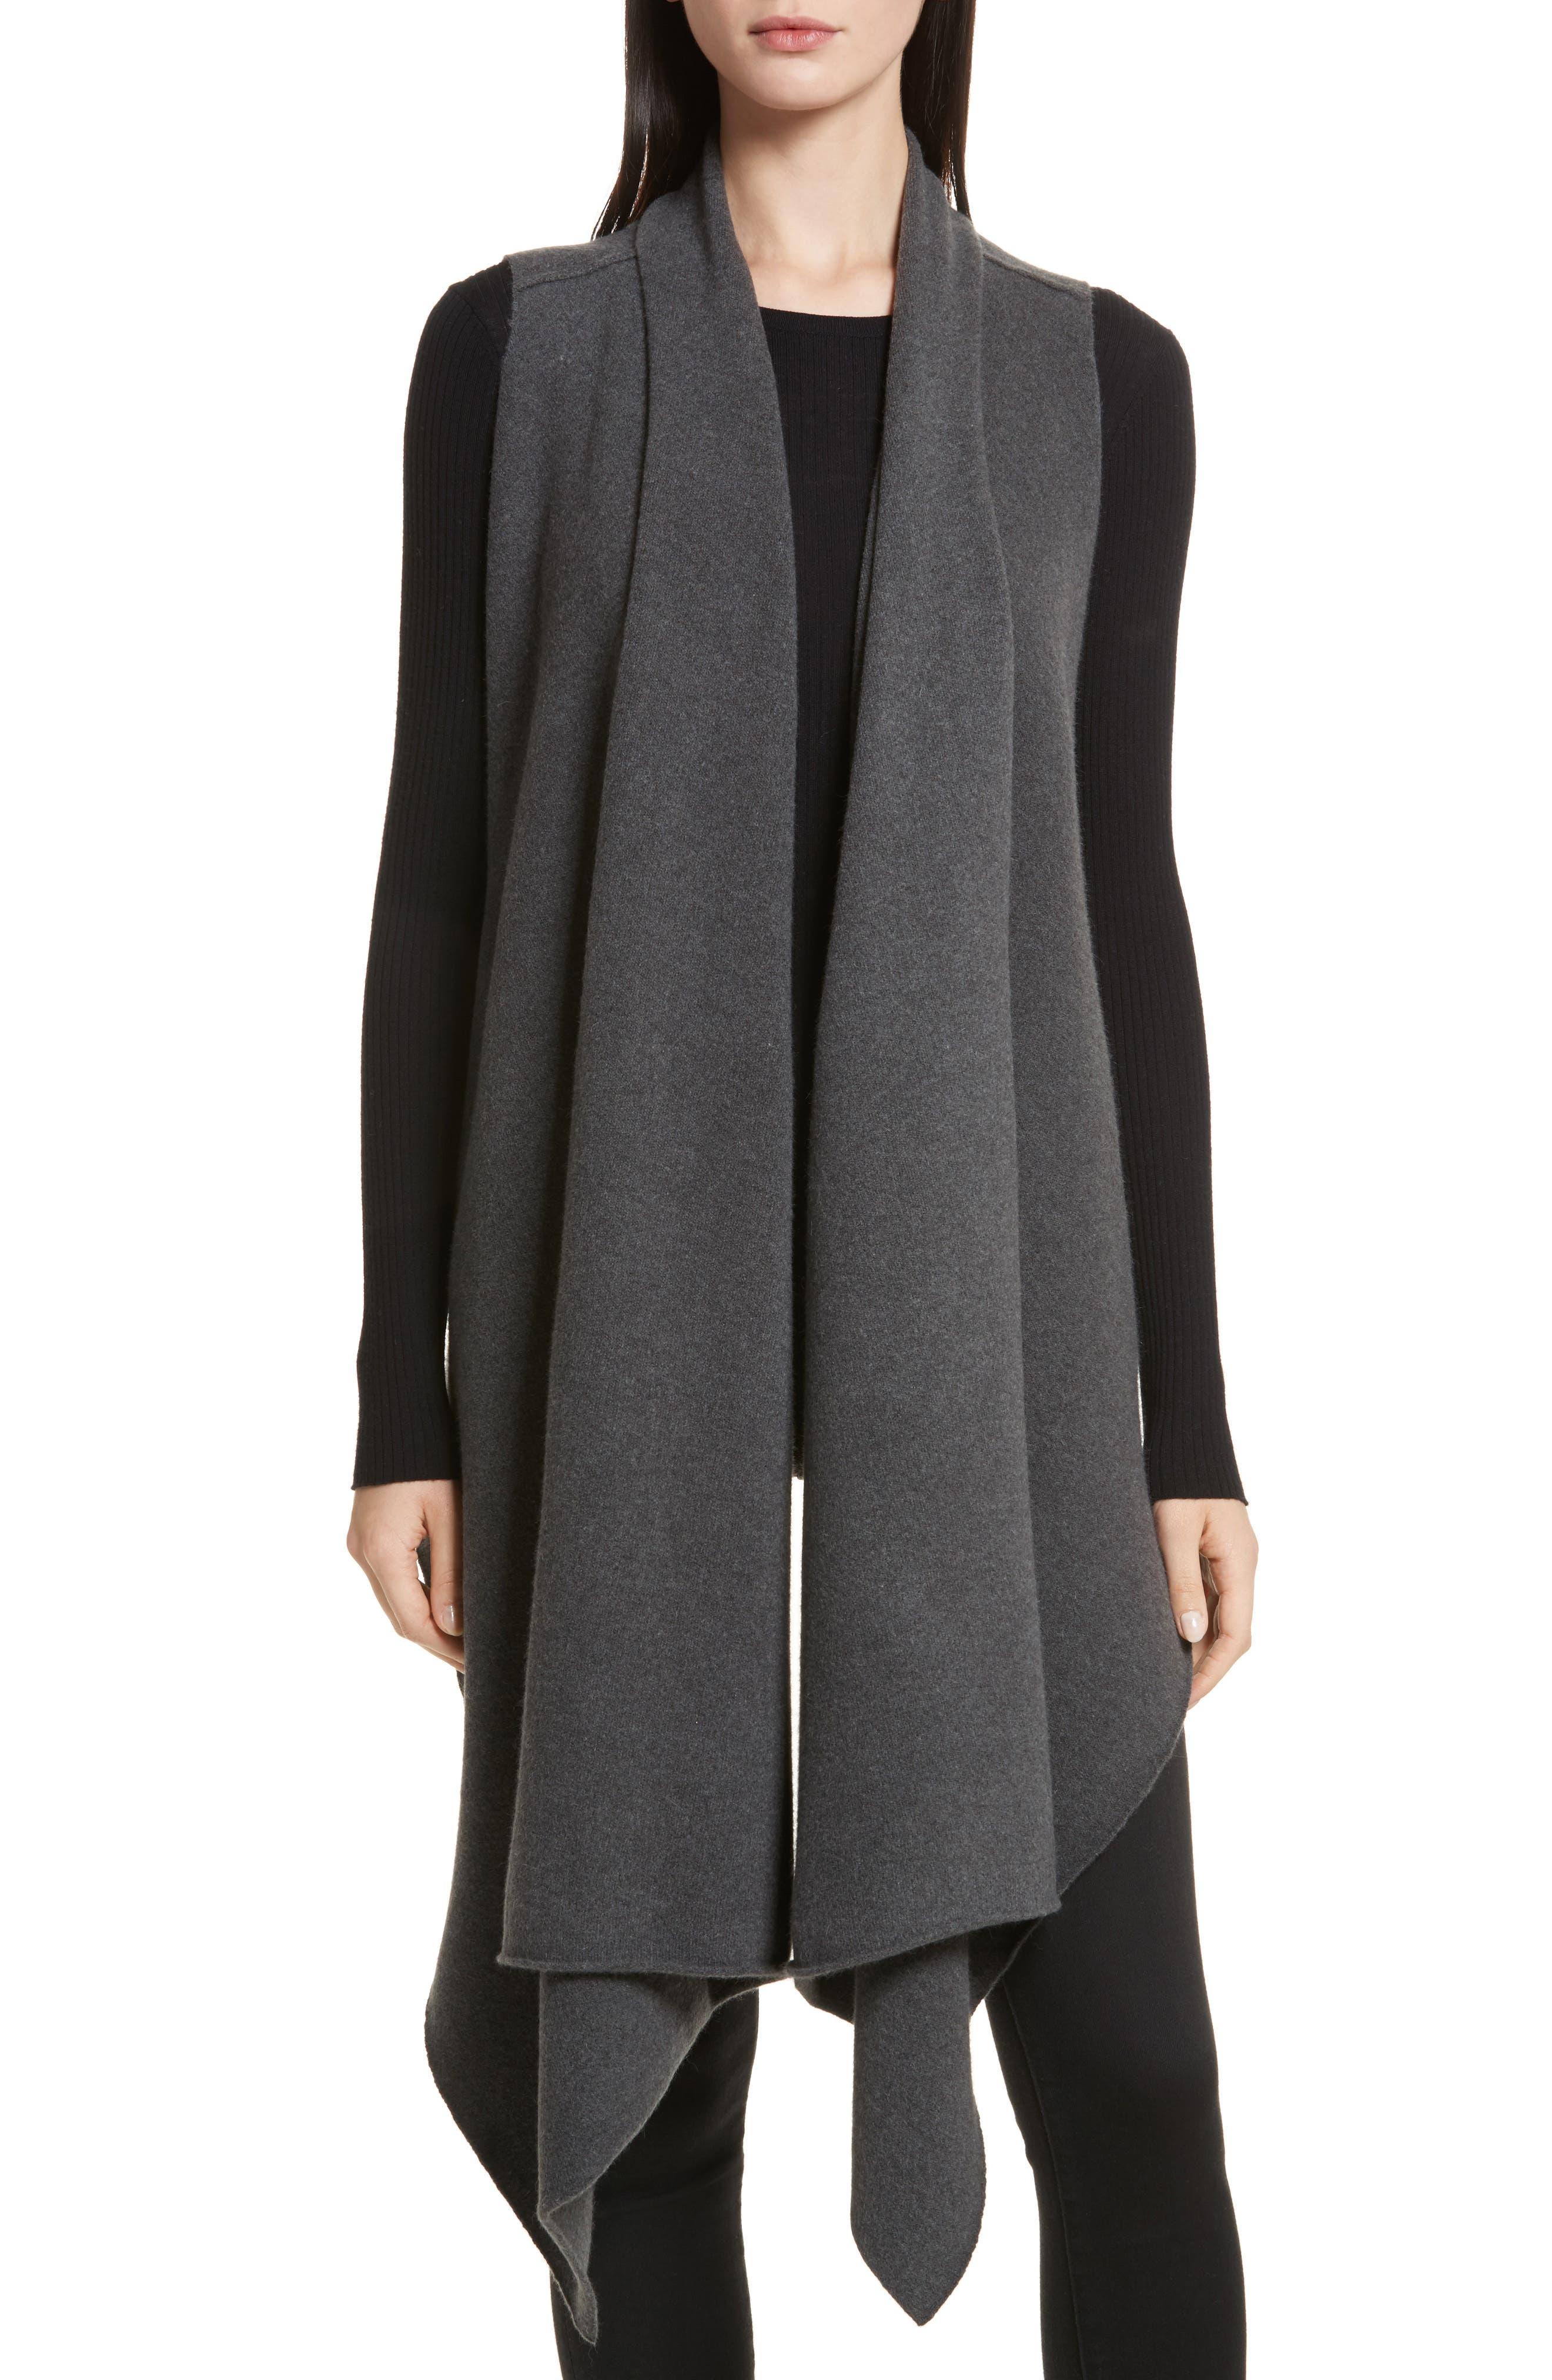 Sorin Merino Wool Blend Wrap Vest,                         Main,                         color, 020